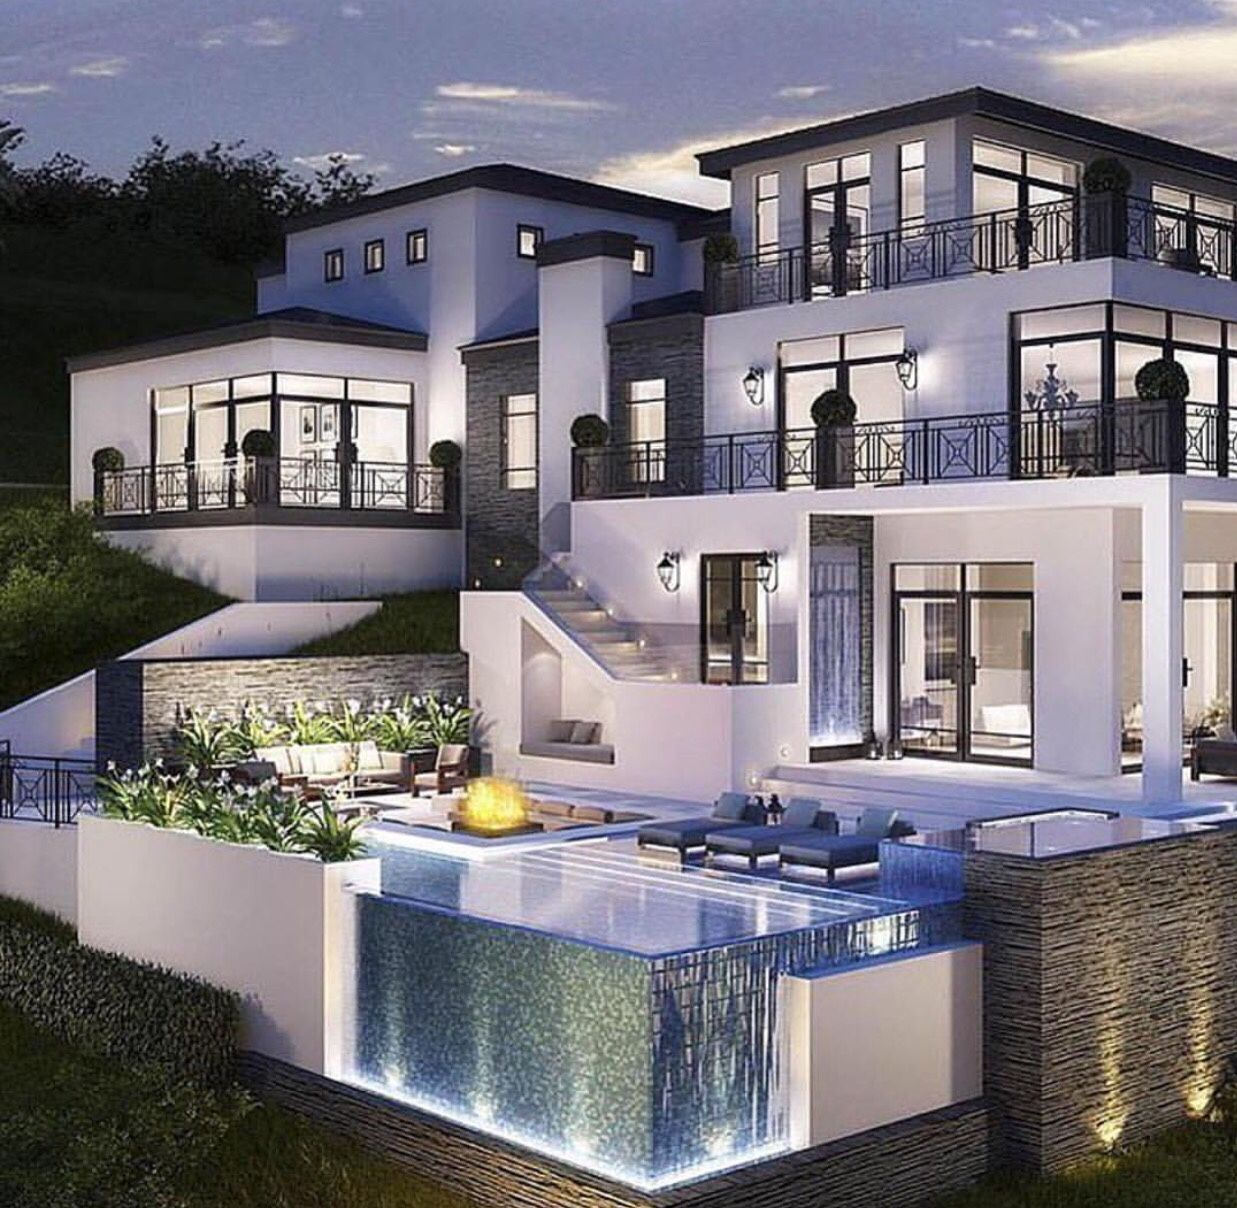 Bloxburg Mansion Modern House with Pool